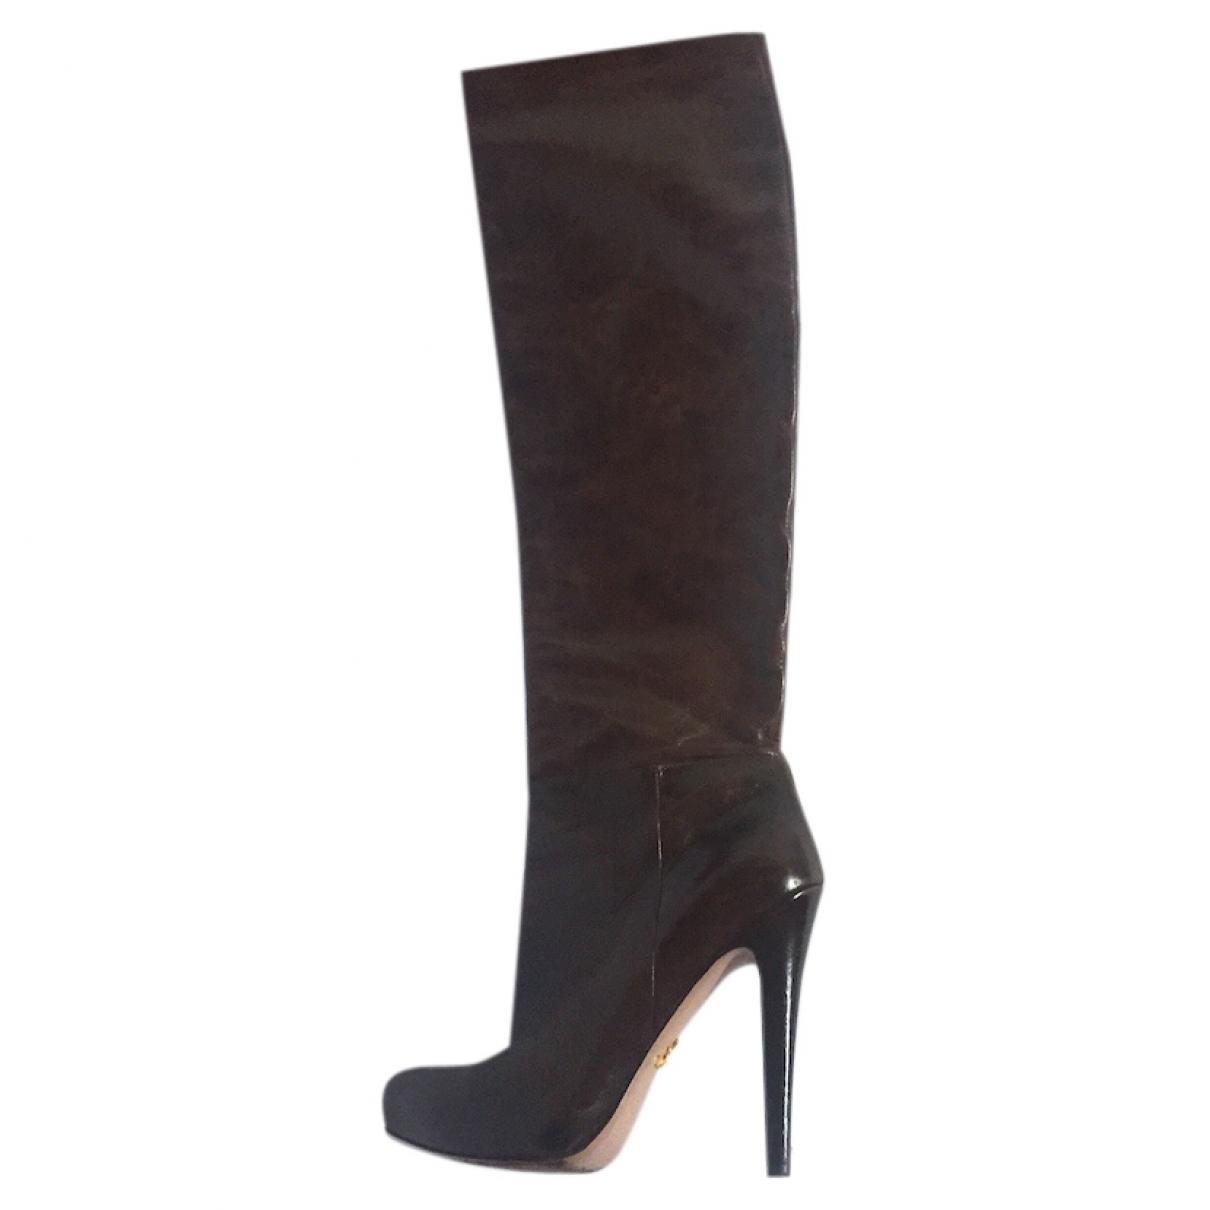 Prada \N Brown Leather Boots for Women 37.5 EU